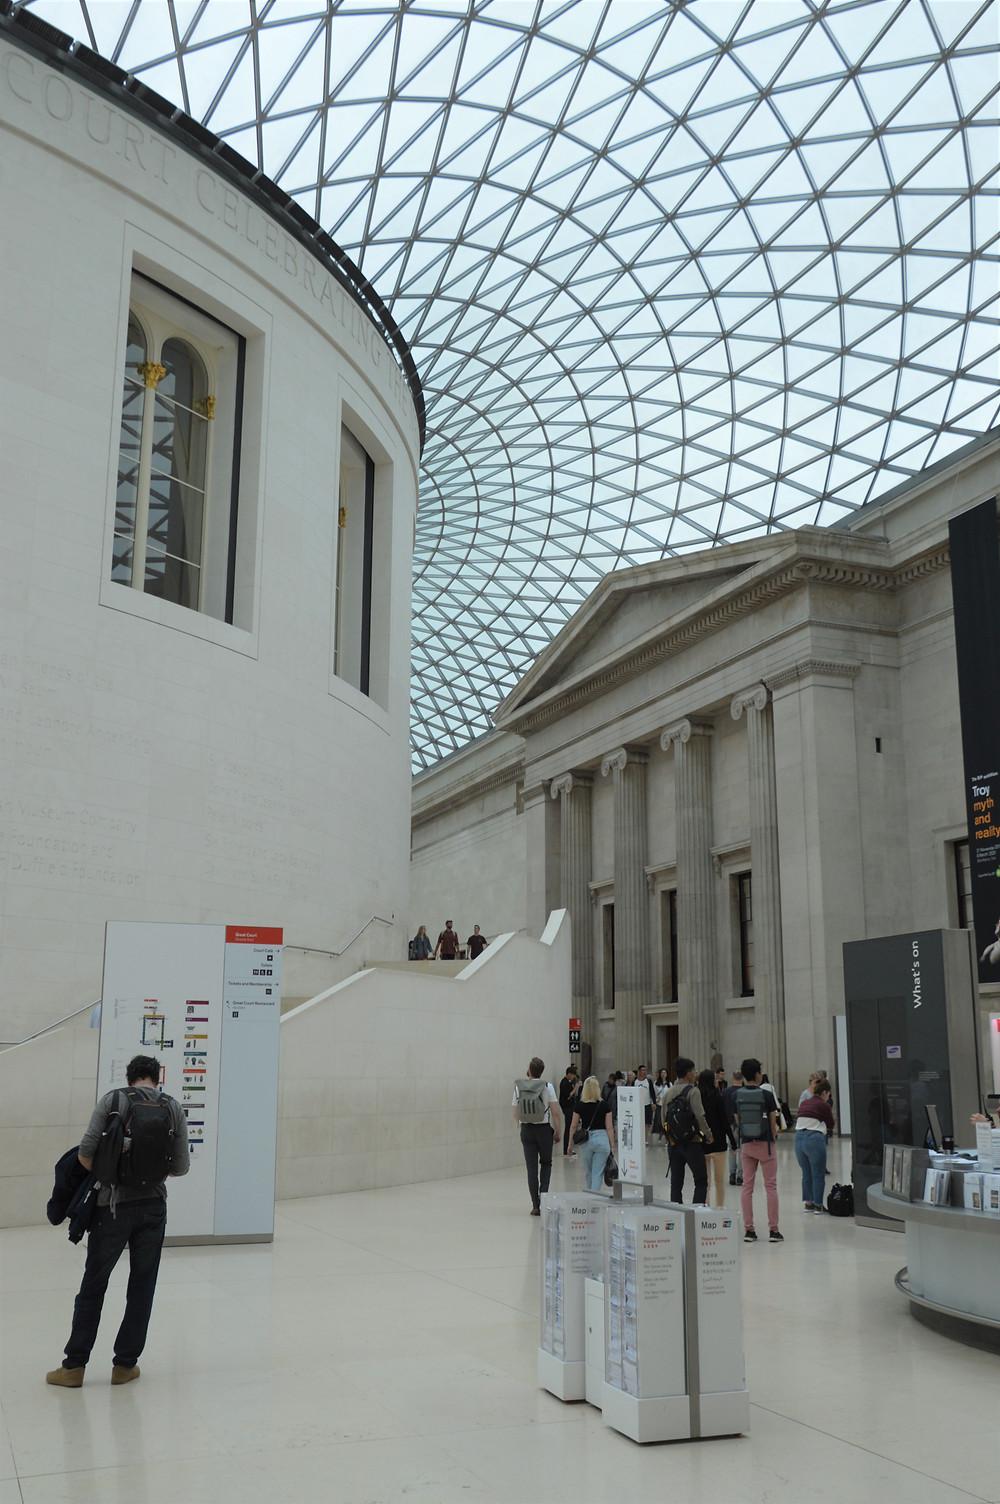 Glass roof over the Queen Elizabeth II Great Court in The British Museum